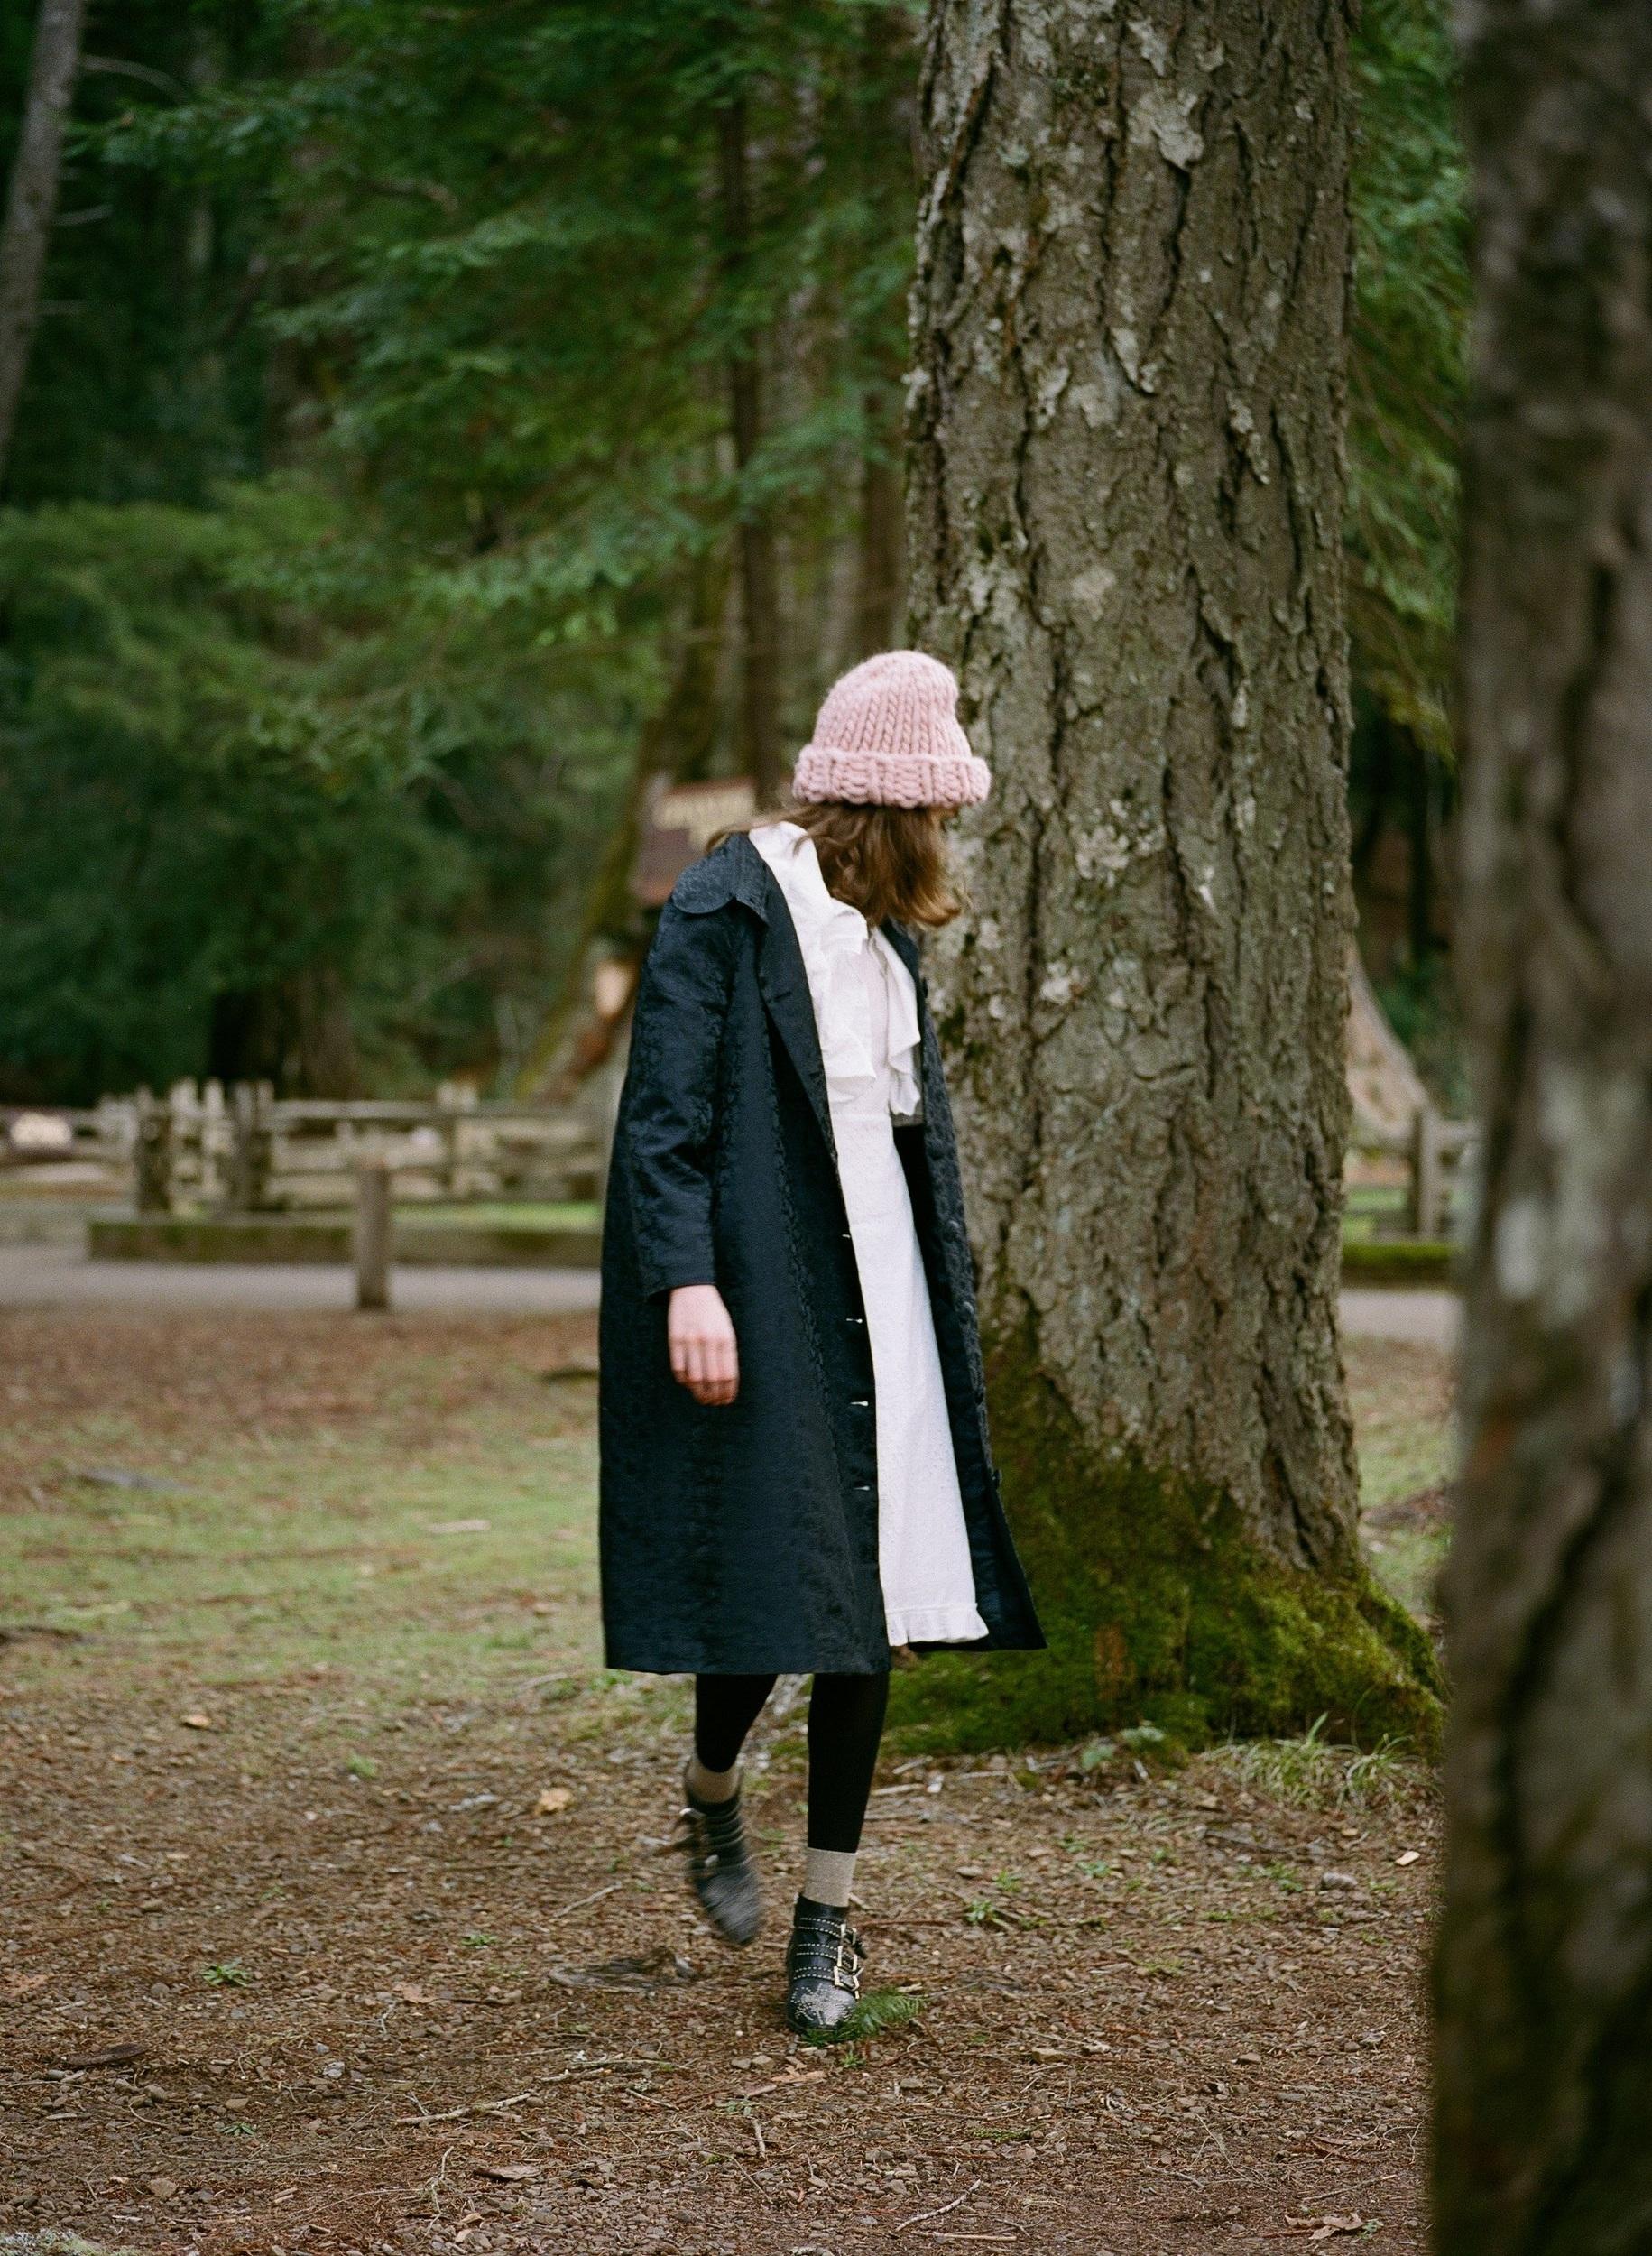 IvanaHelsinki-Trees2019-Lana-21.jpg